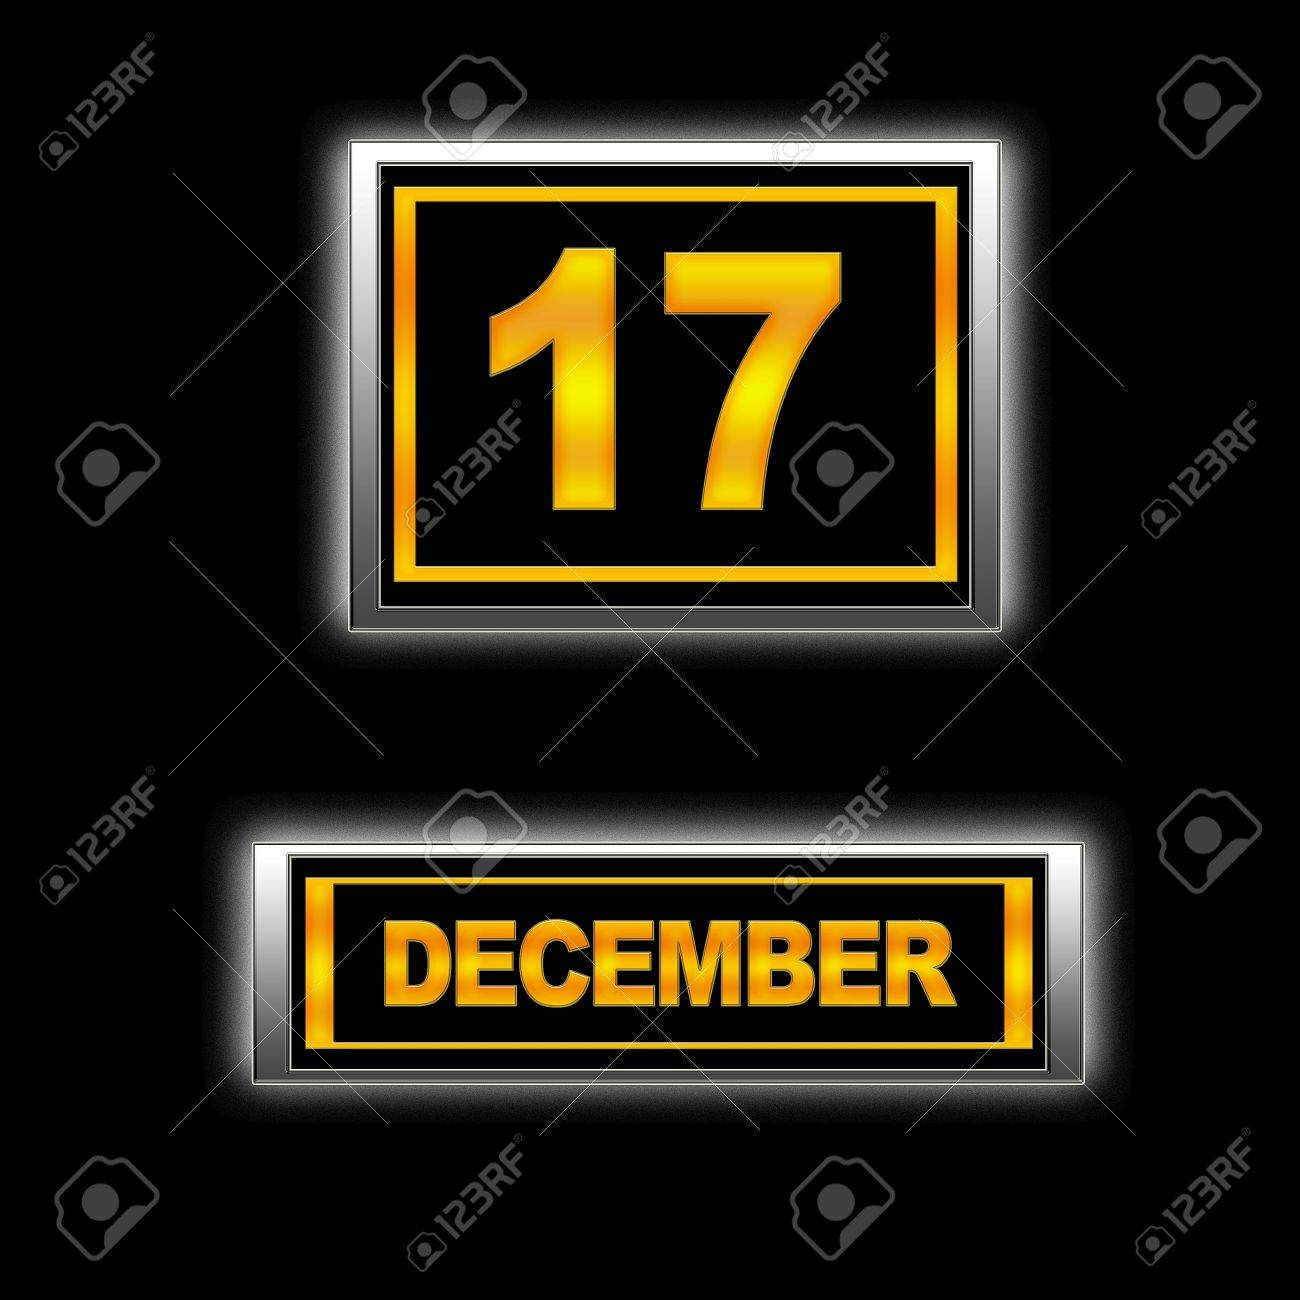 Illustration with Calendar, December 17. Stock Photo - 13268206